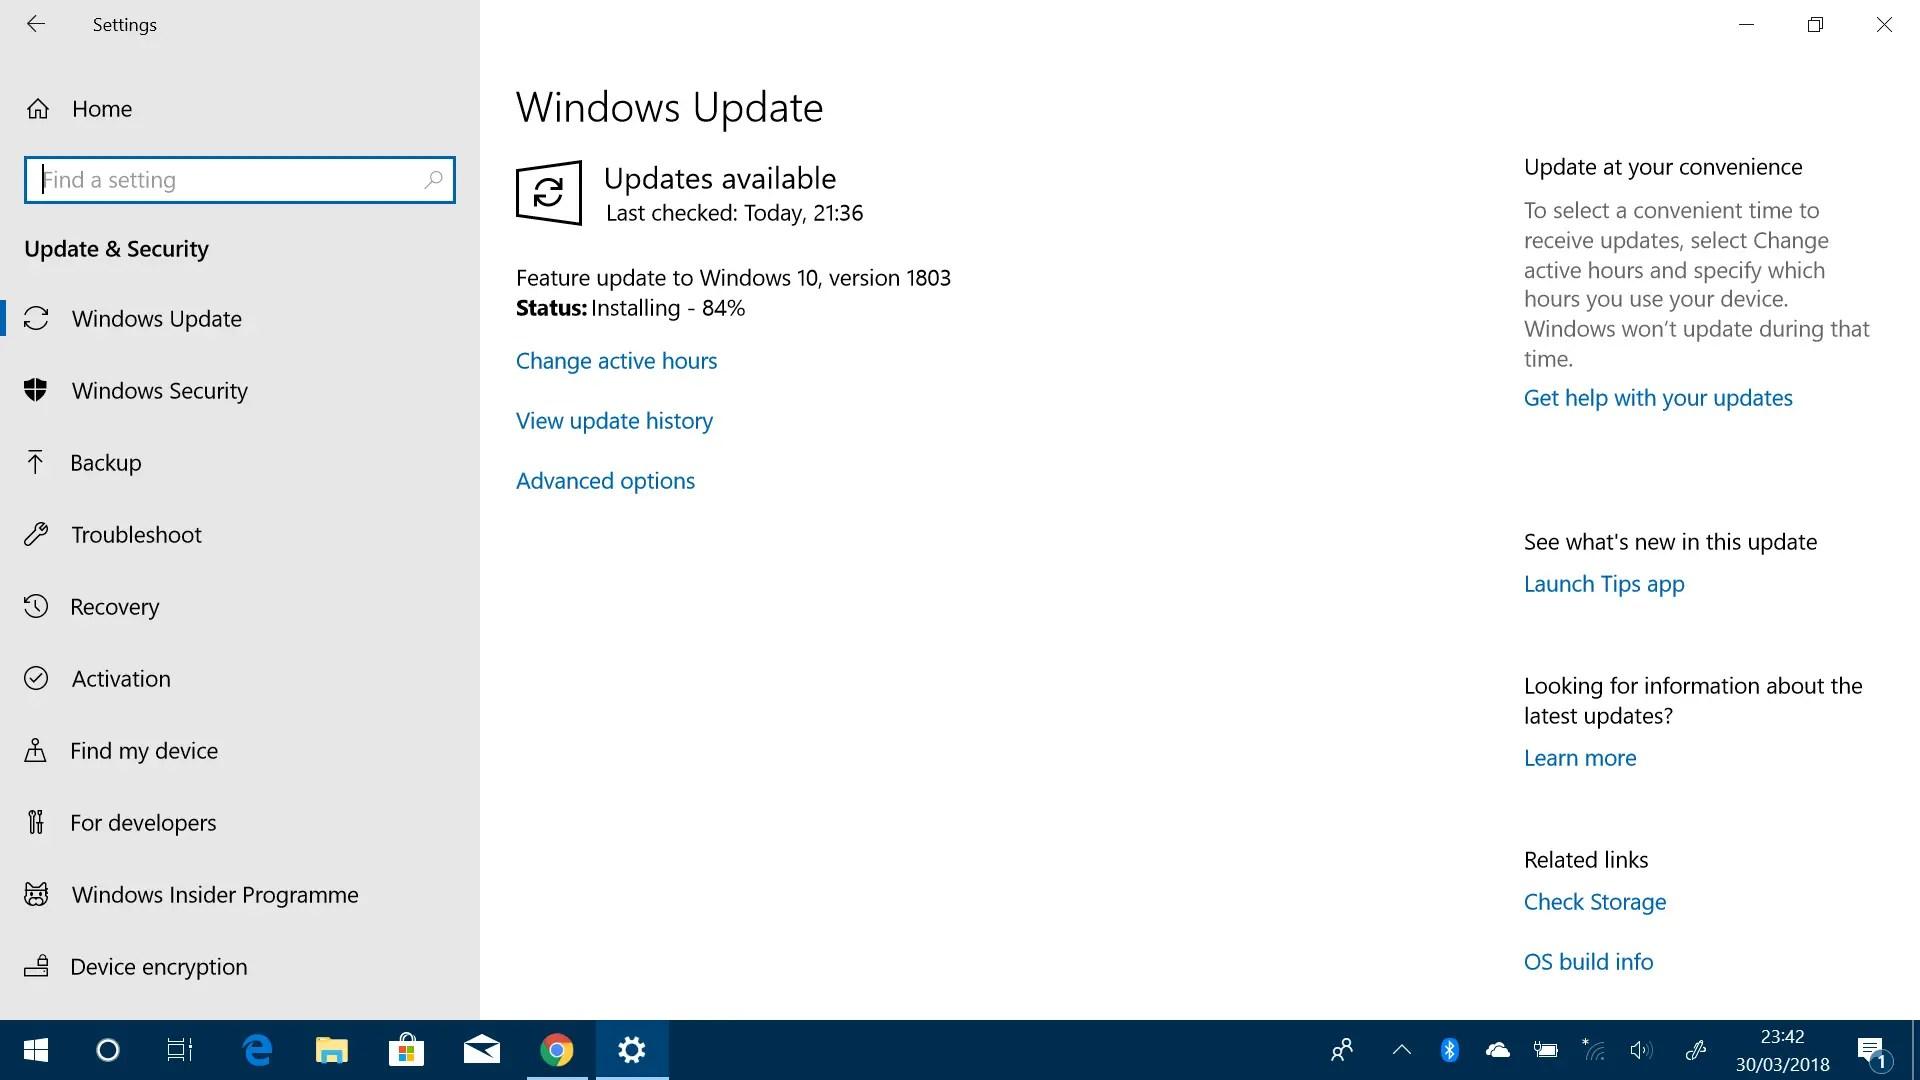 Windows windows 10 version 1803 | Windows 10 version 1903 failed to